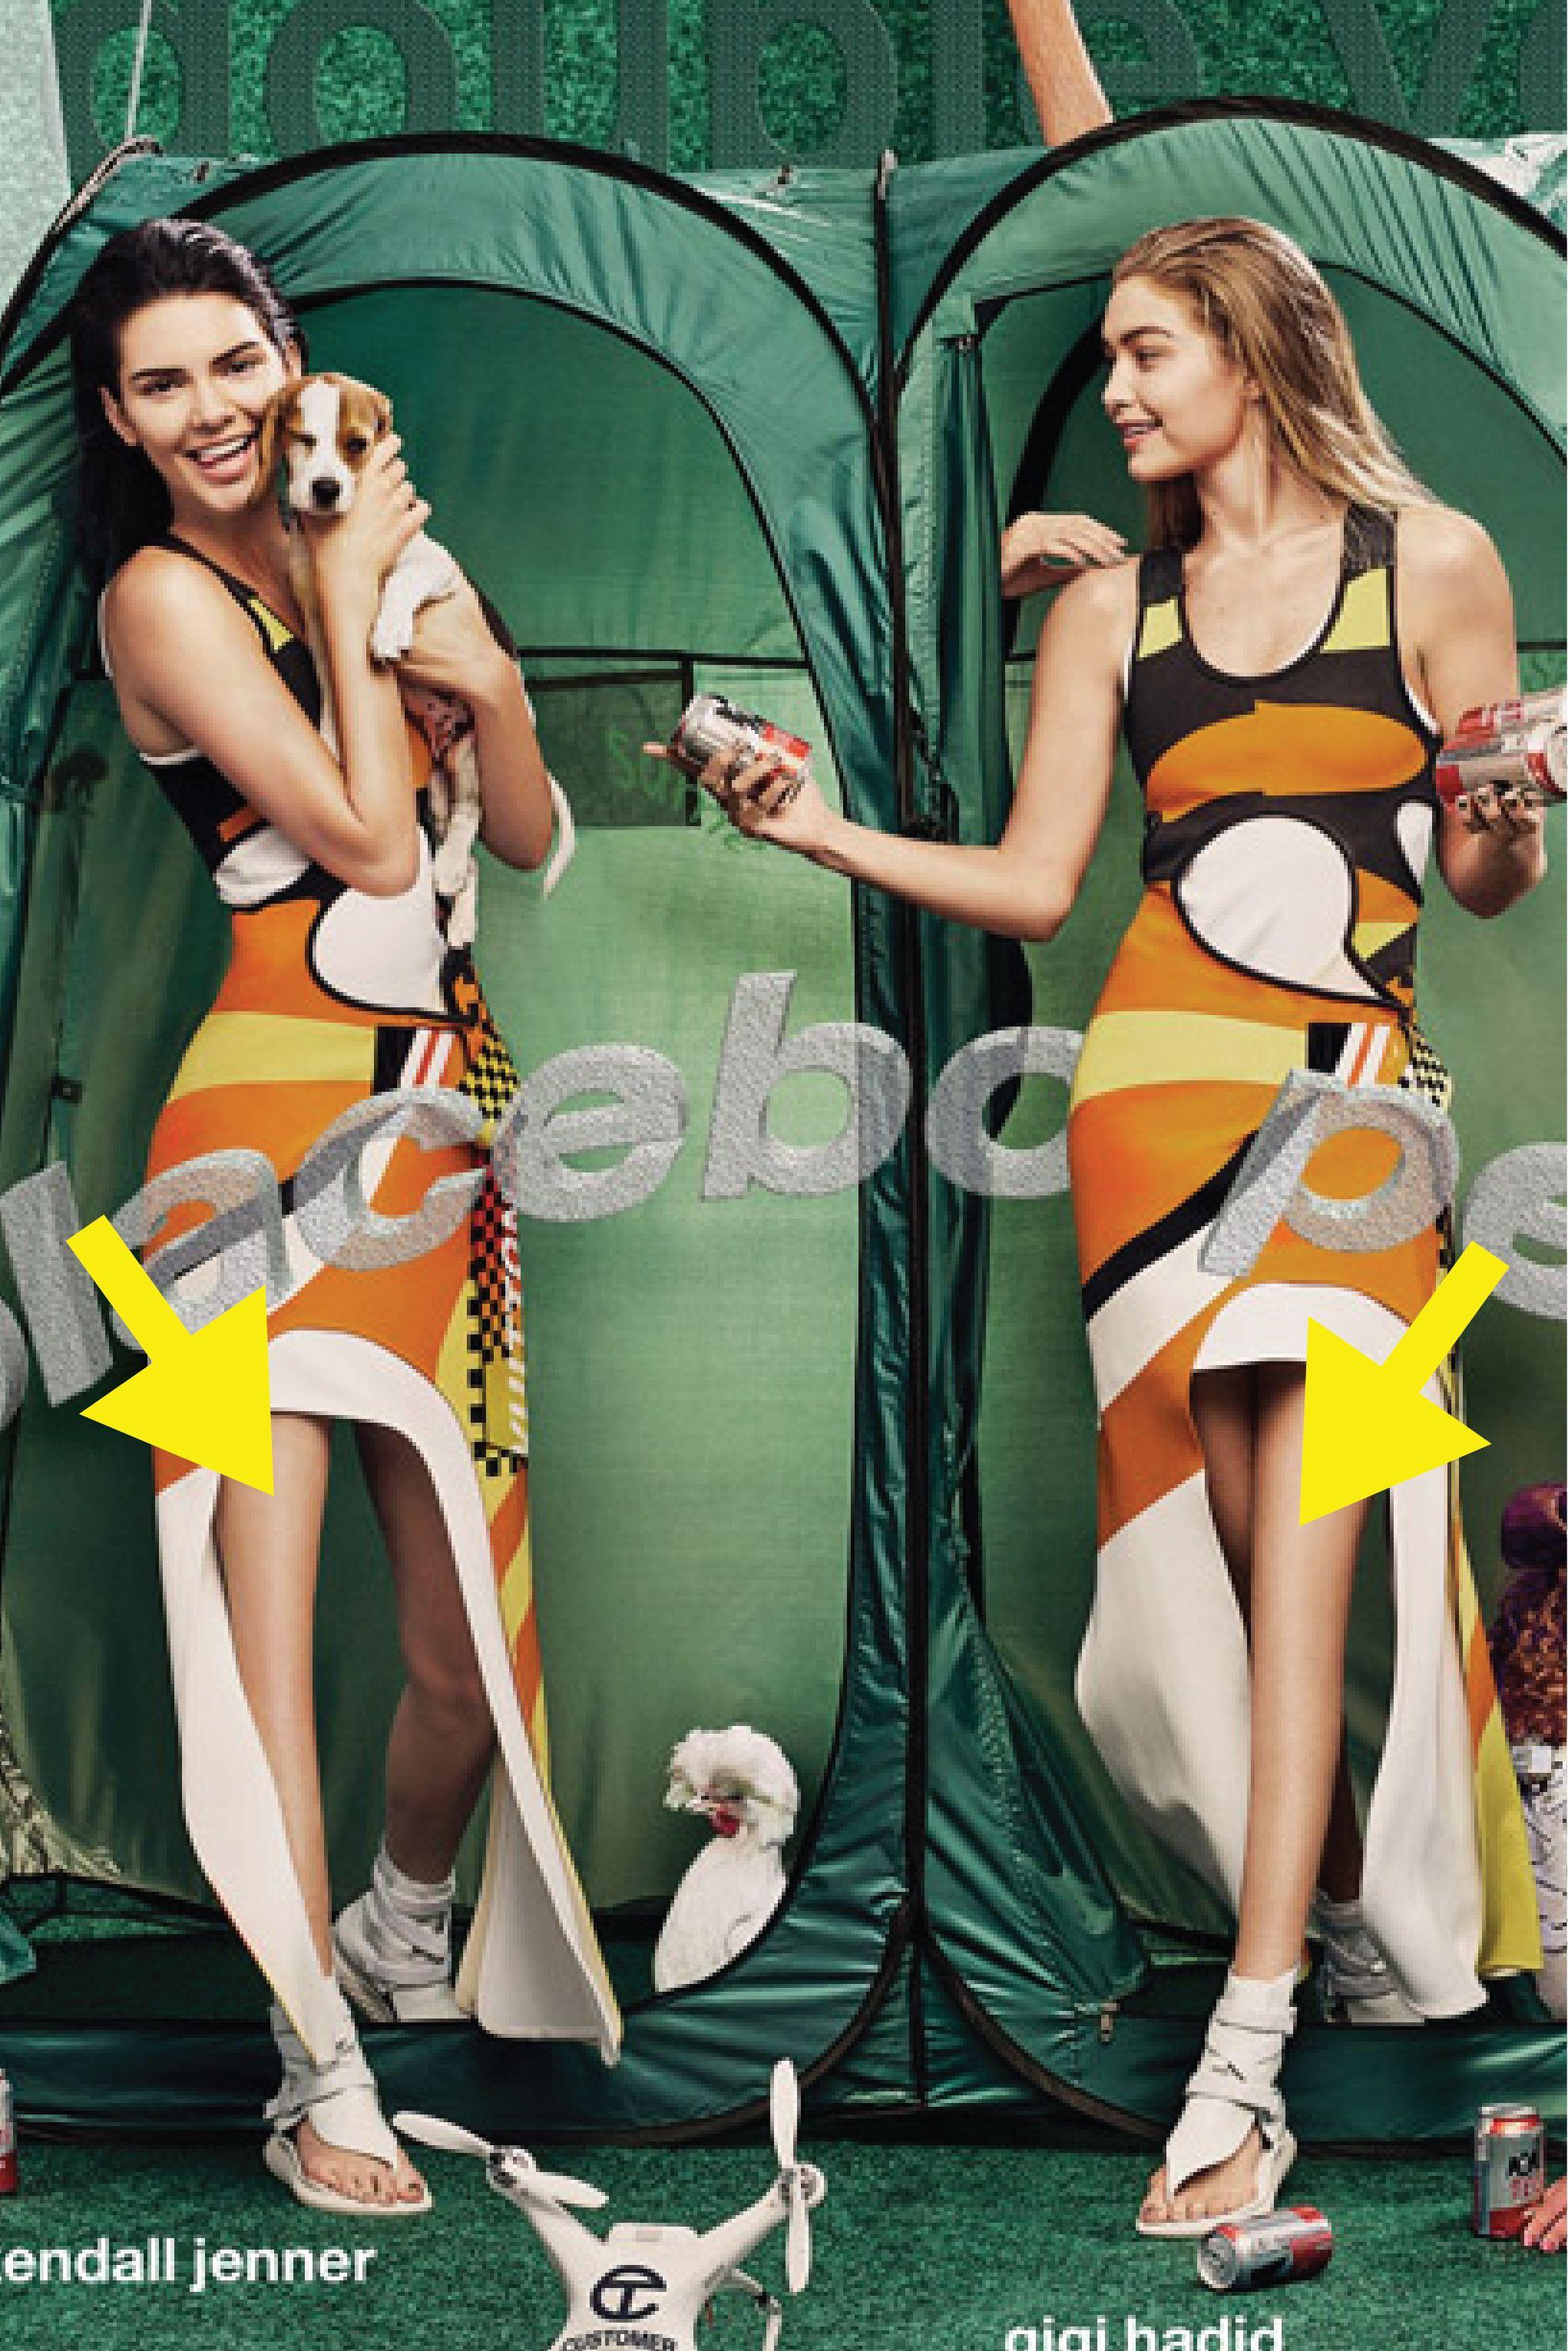 Kendall Jenner and Gigi Hadid Fall Victim to Terrible Photoshop Fail